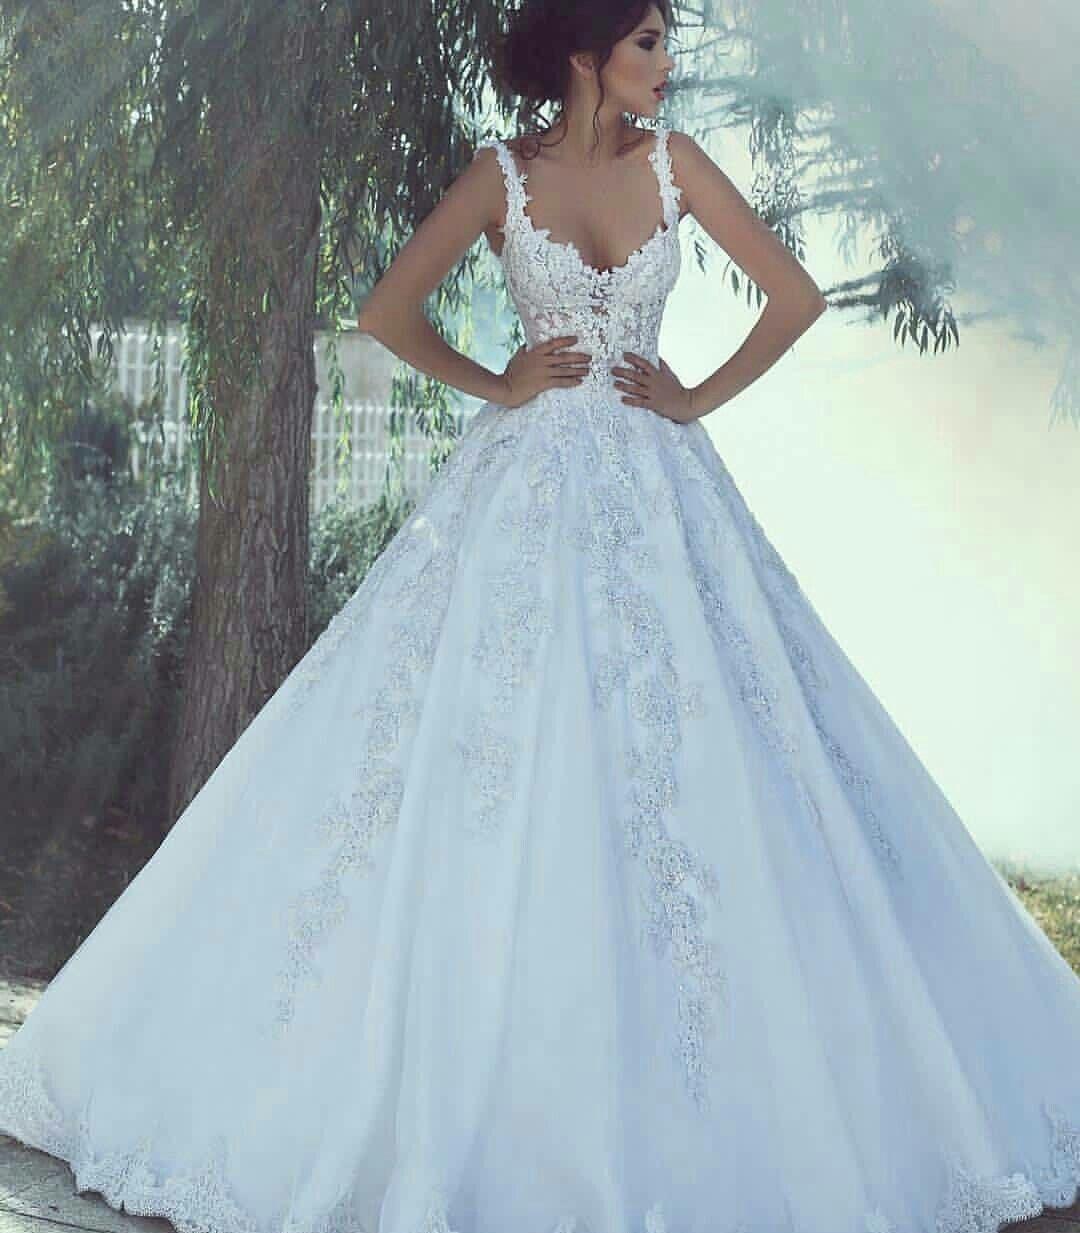 Pin by Seda_M on Gelinlikk HAYALIMM | Pinterest | Wedding dress ...